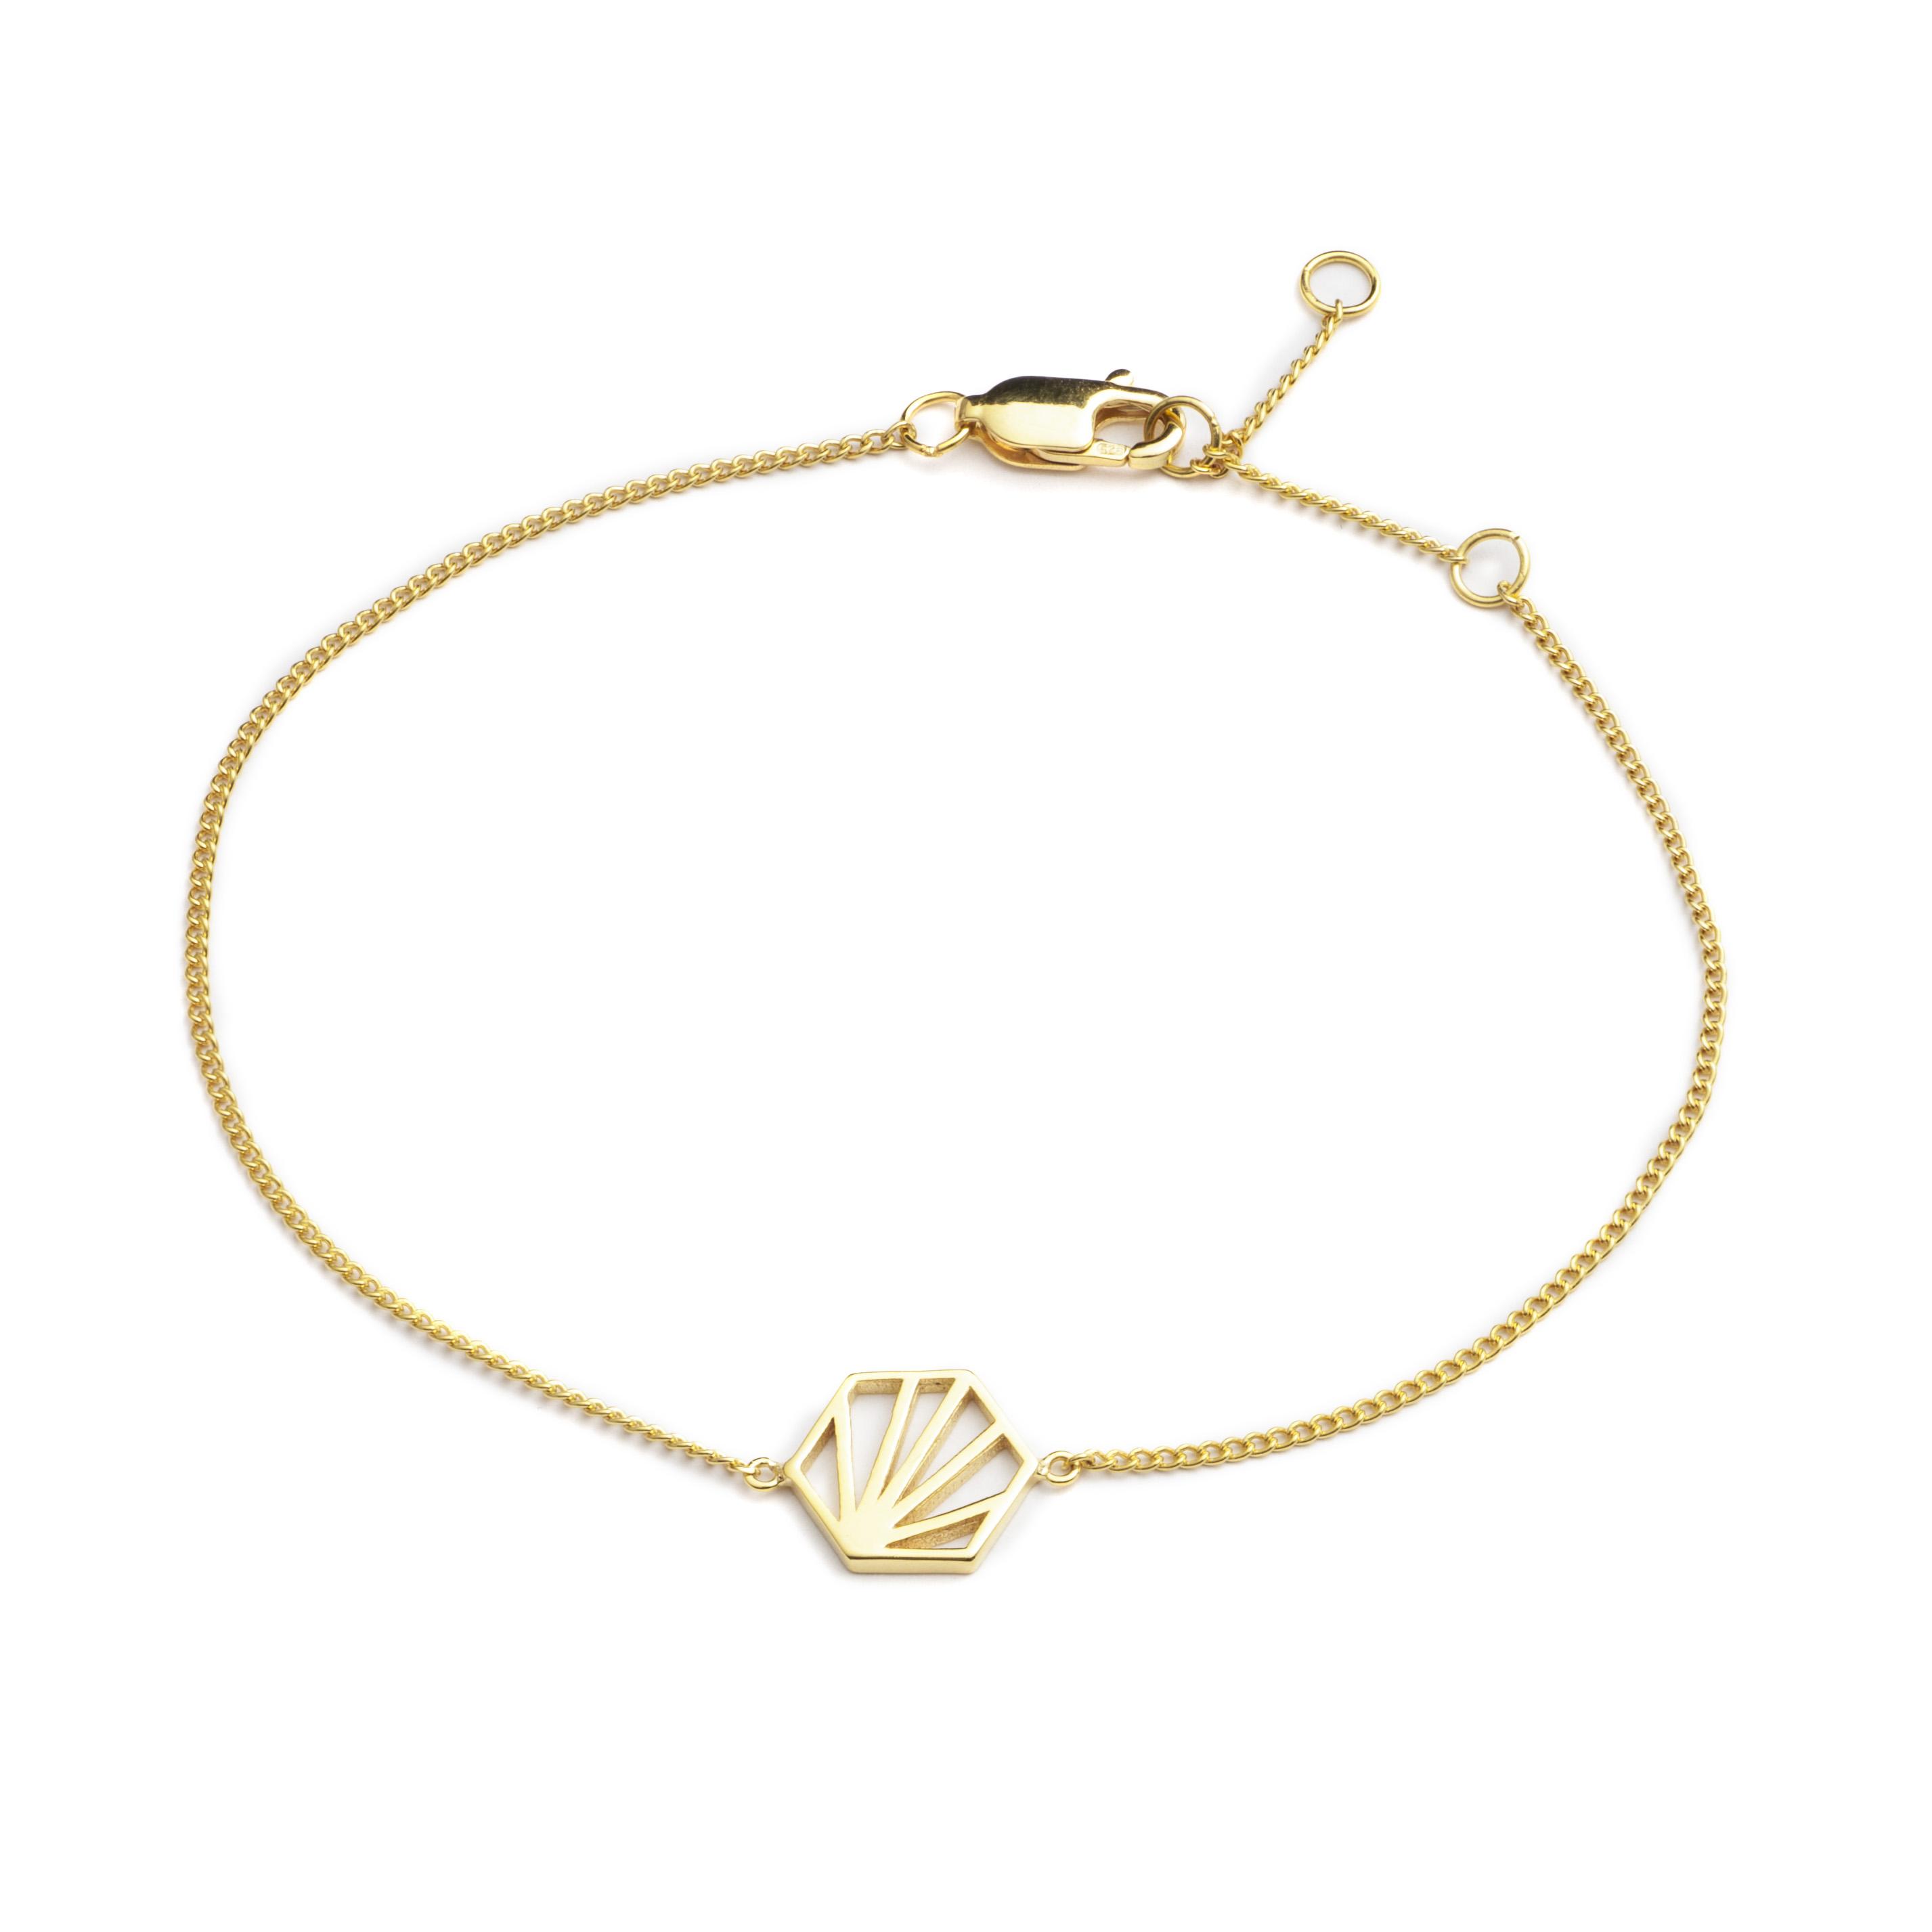 SERENITY HEXAGON CHAIN BRACELET - GOLD